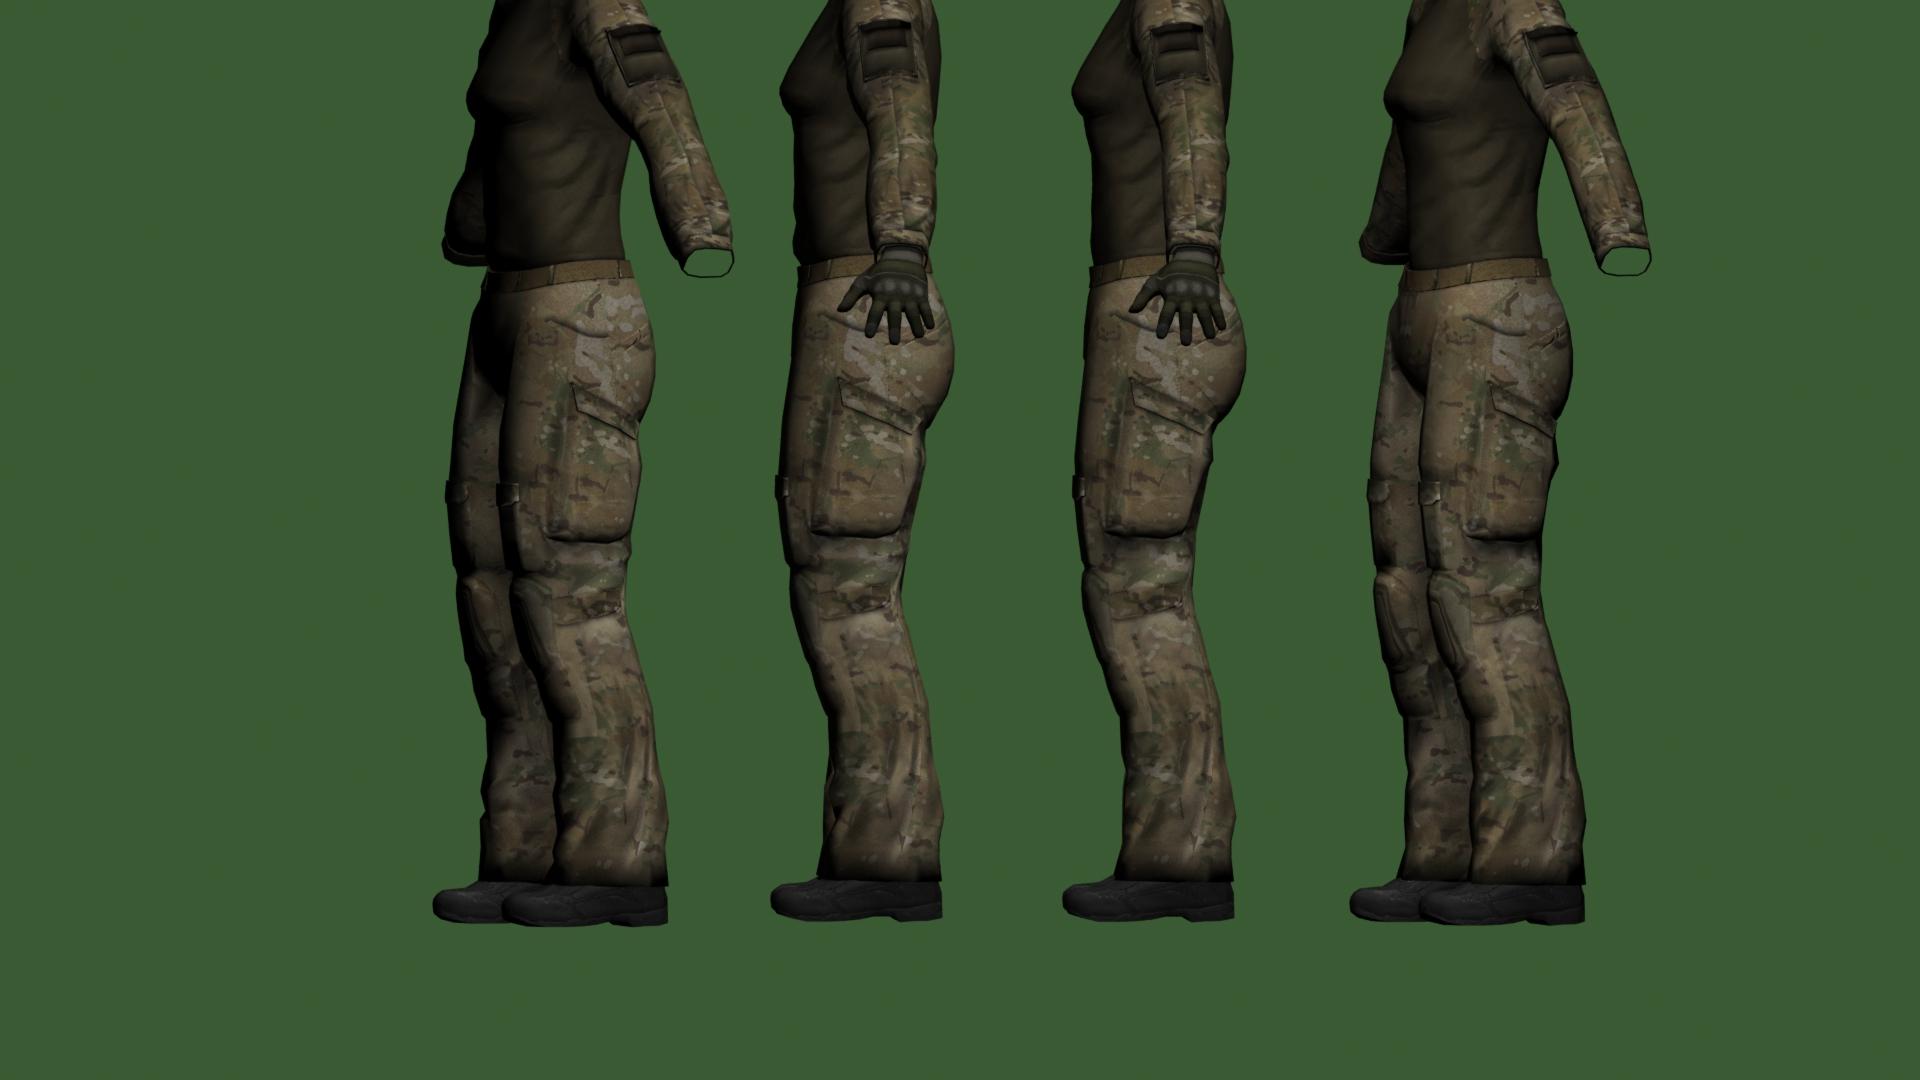 new_legs_by_zeealex-d8e5k5h.jpg